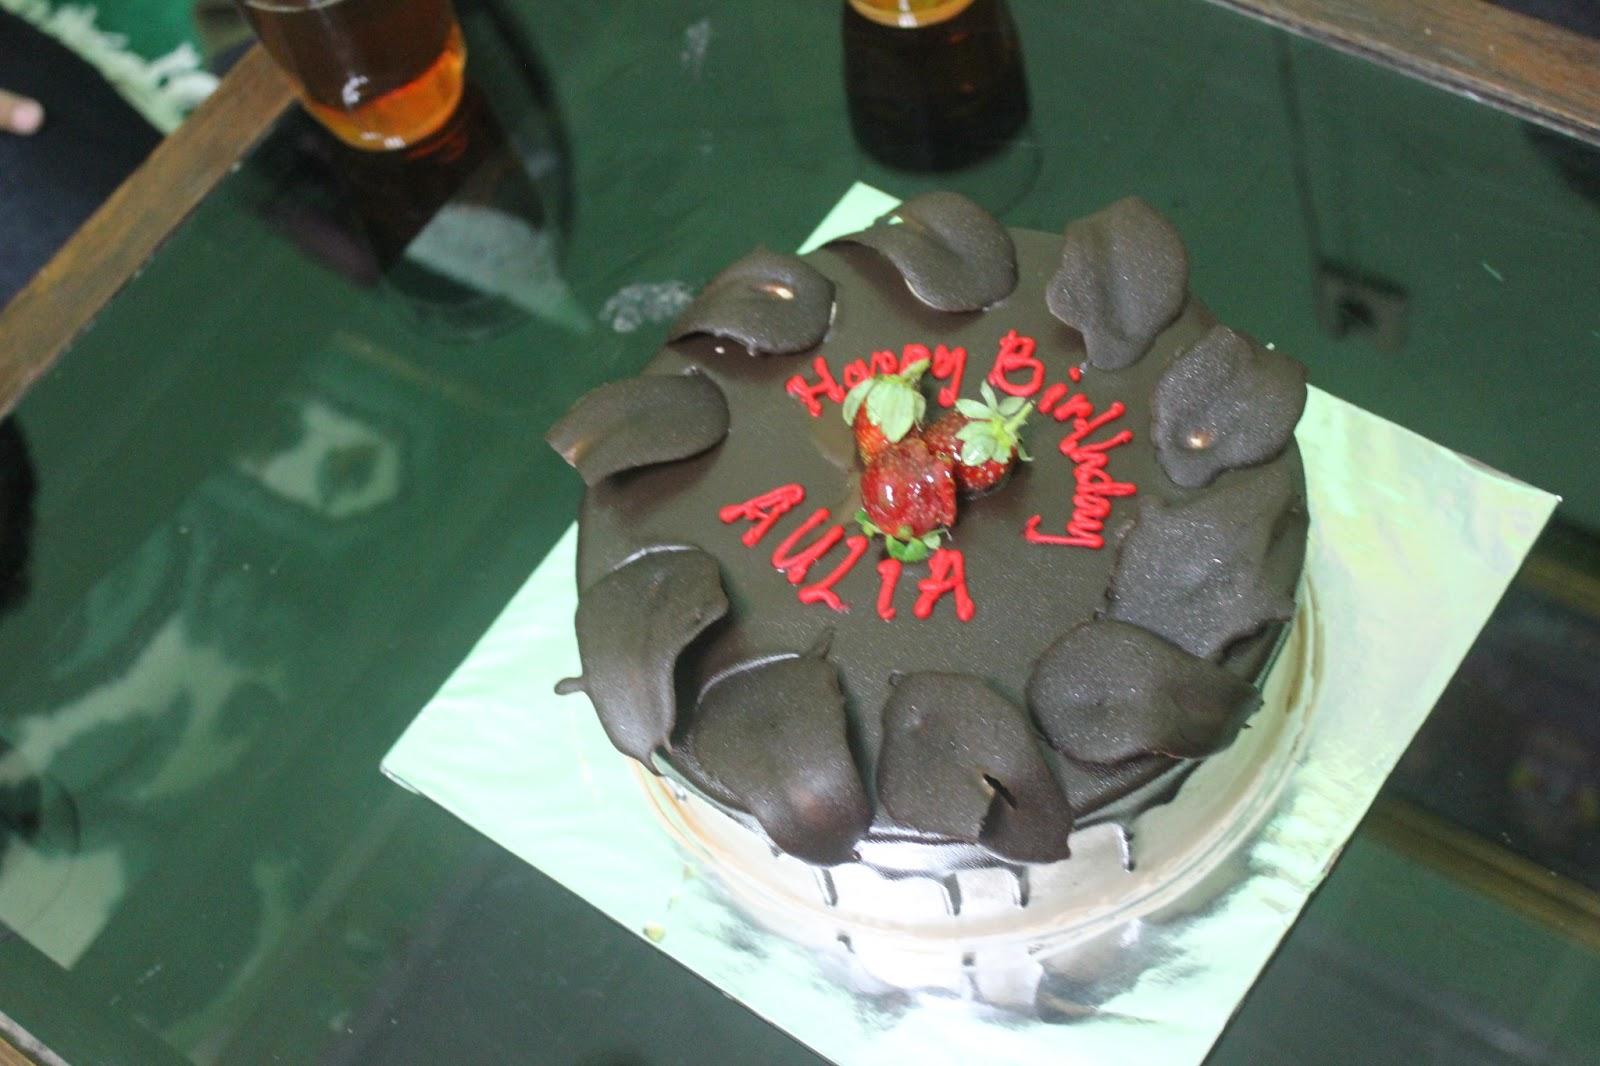 Happy Birthday Aulia,Akhtar, Aulia, aulia pervaiz, aulia pervaiz akhtar, aulia perviaz, aulia perviaz akhtar, Birthday, chaudhry, chaudhry Aulia, chaudhry Aulia Pervaiz, chaudhry Aulia Pervaiz akhtar, chaudhry aulia pervez akhtar, chaudhry aulia perviaz akhtar, Cheer Up, happy, Happy Birthday, Happy Birthday – Cheer Up, Happy birthday akhtar, happy birthday aulia, Happy birthday Aulia Pervaiz, Happy Birthday Chaudhry Aulia, Happy birthday Chaudhry Aulia Pervaiz, Happy Birthday chaudhry Aulia Pervaiz akhtar, HappyBirthday, HappyBirthday Aulia, pervaiz, perviaz akhtar,Happy Birthday Aulia